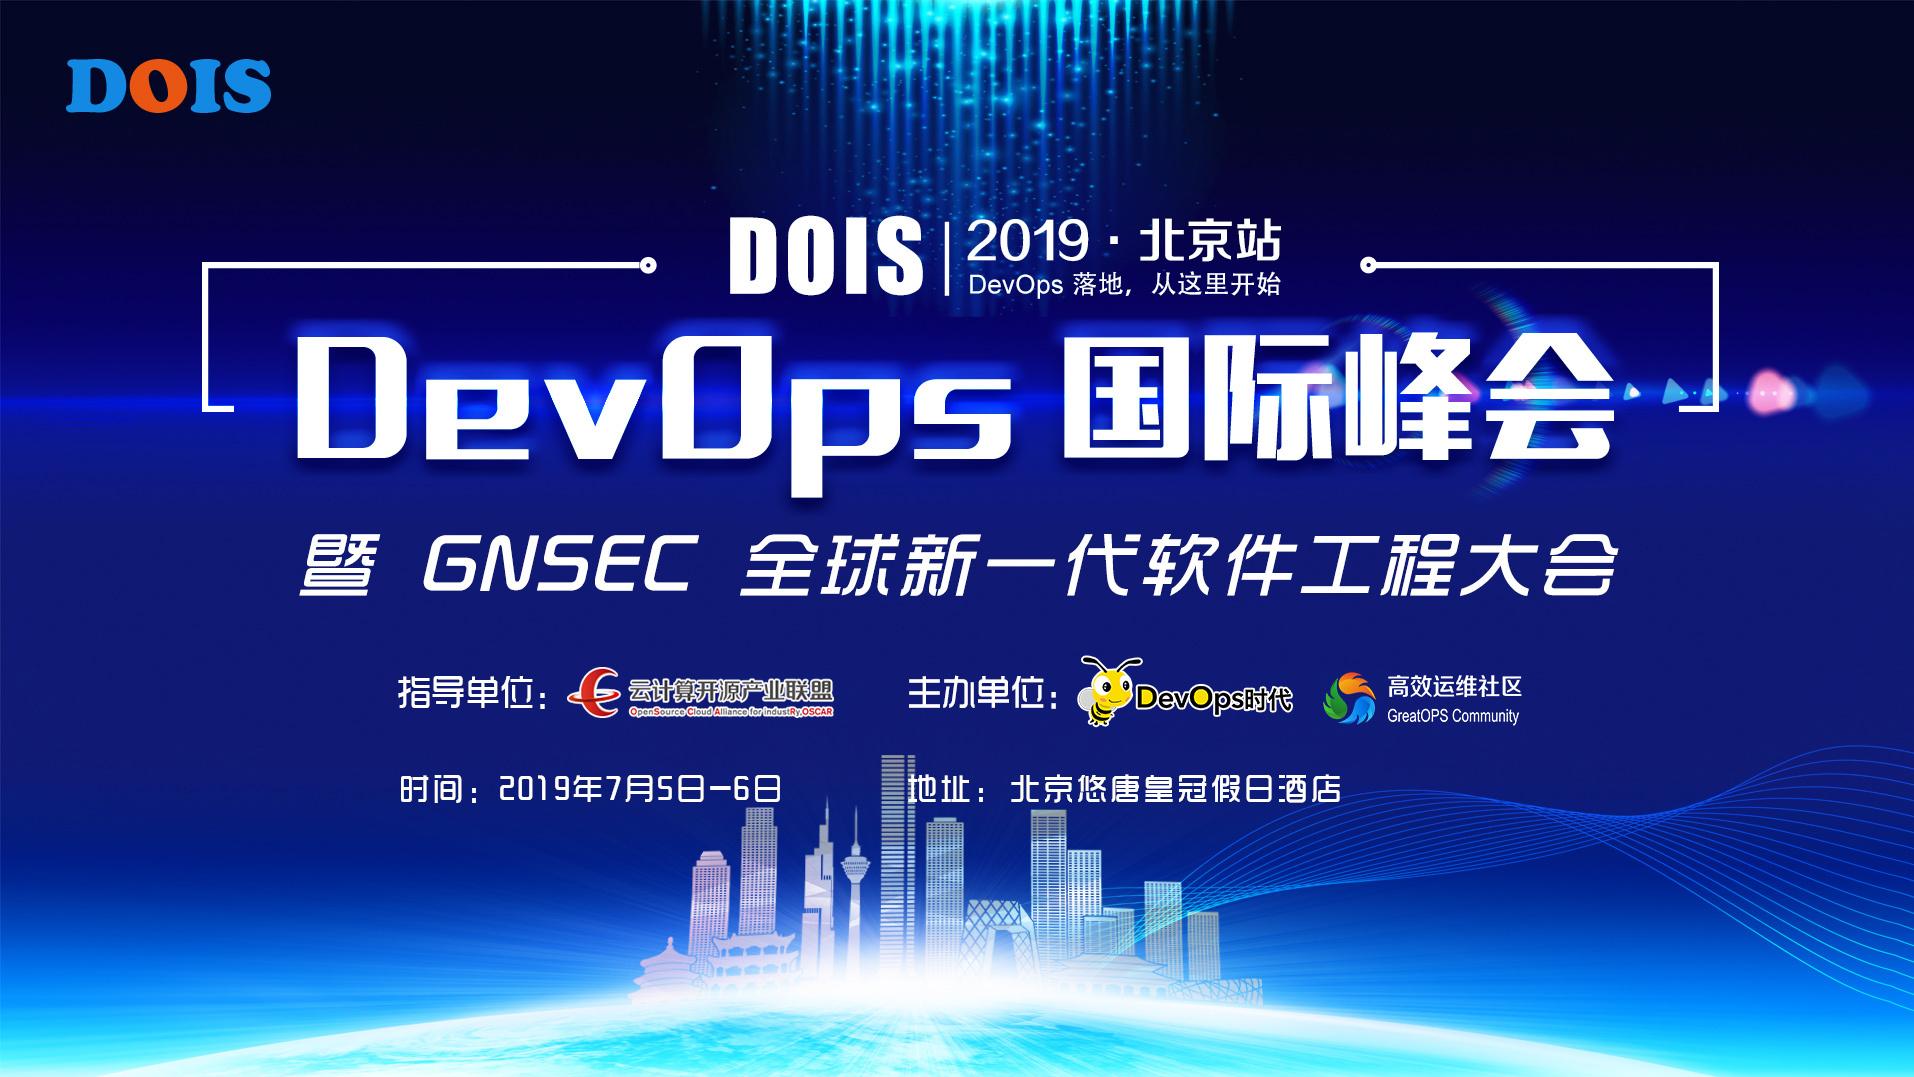 DevOps国际峰会(DOIS)2019北京站